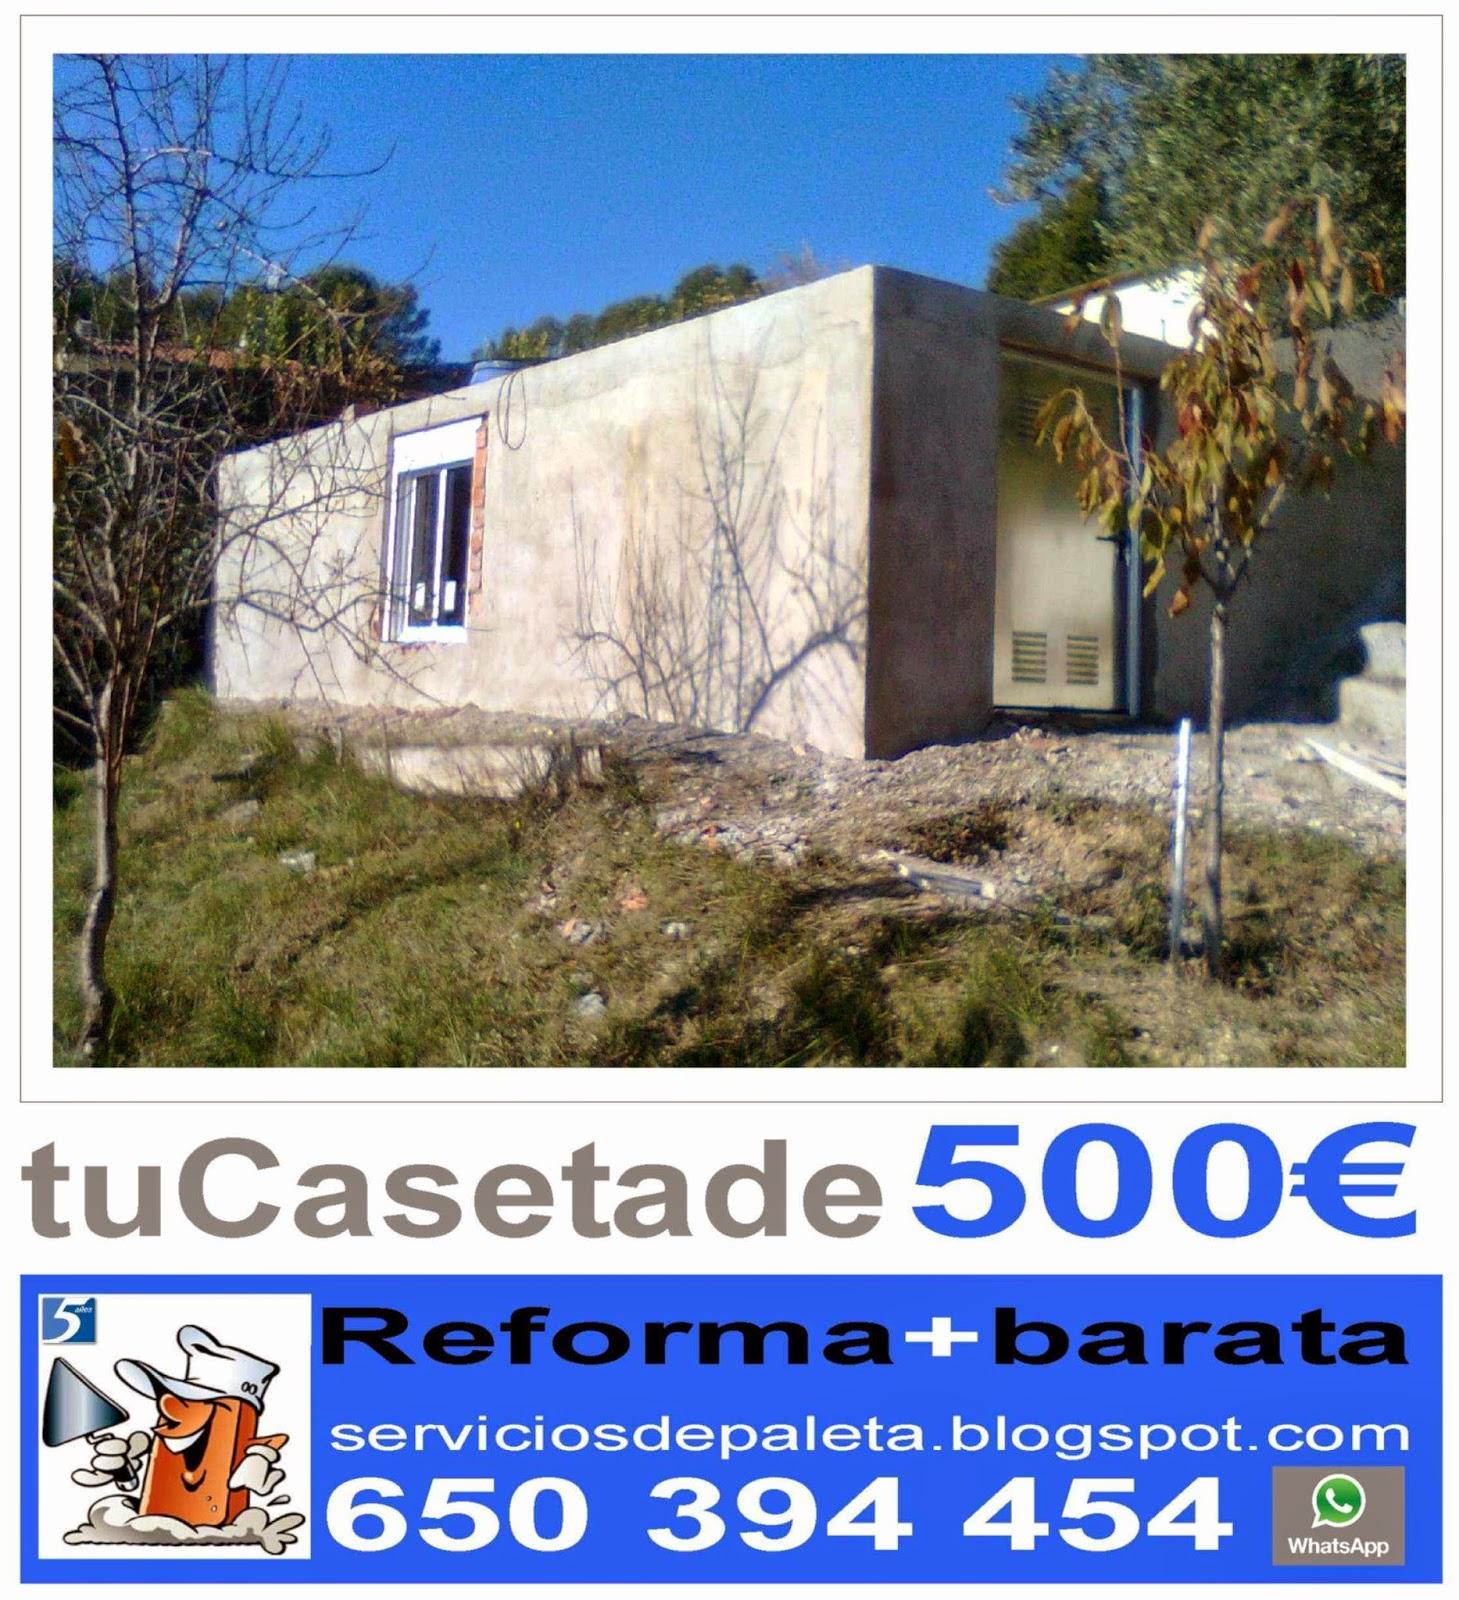 Serviciosdejardineriabasica jardineria barata tucasetade500 for Caseta para guardar bicis